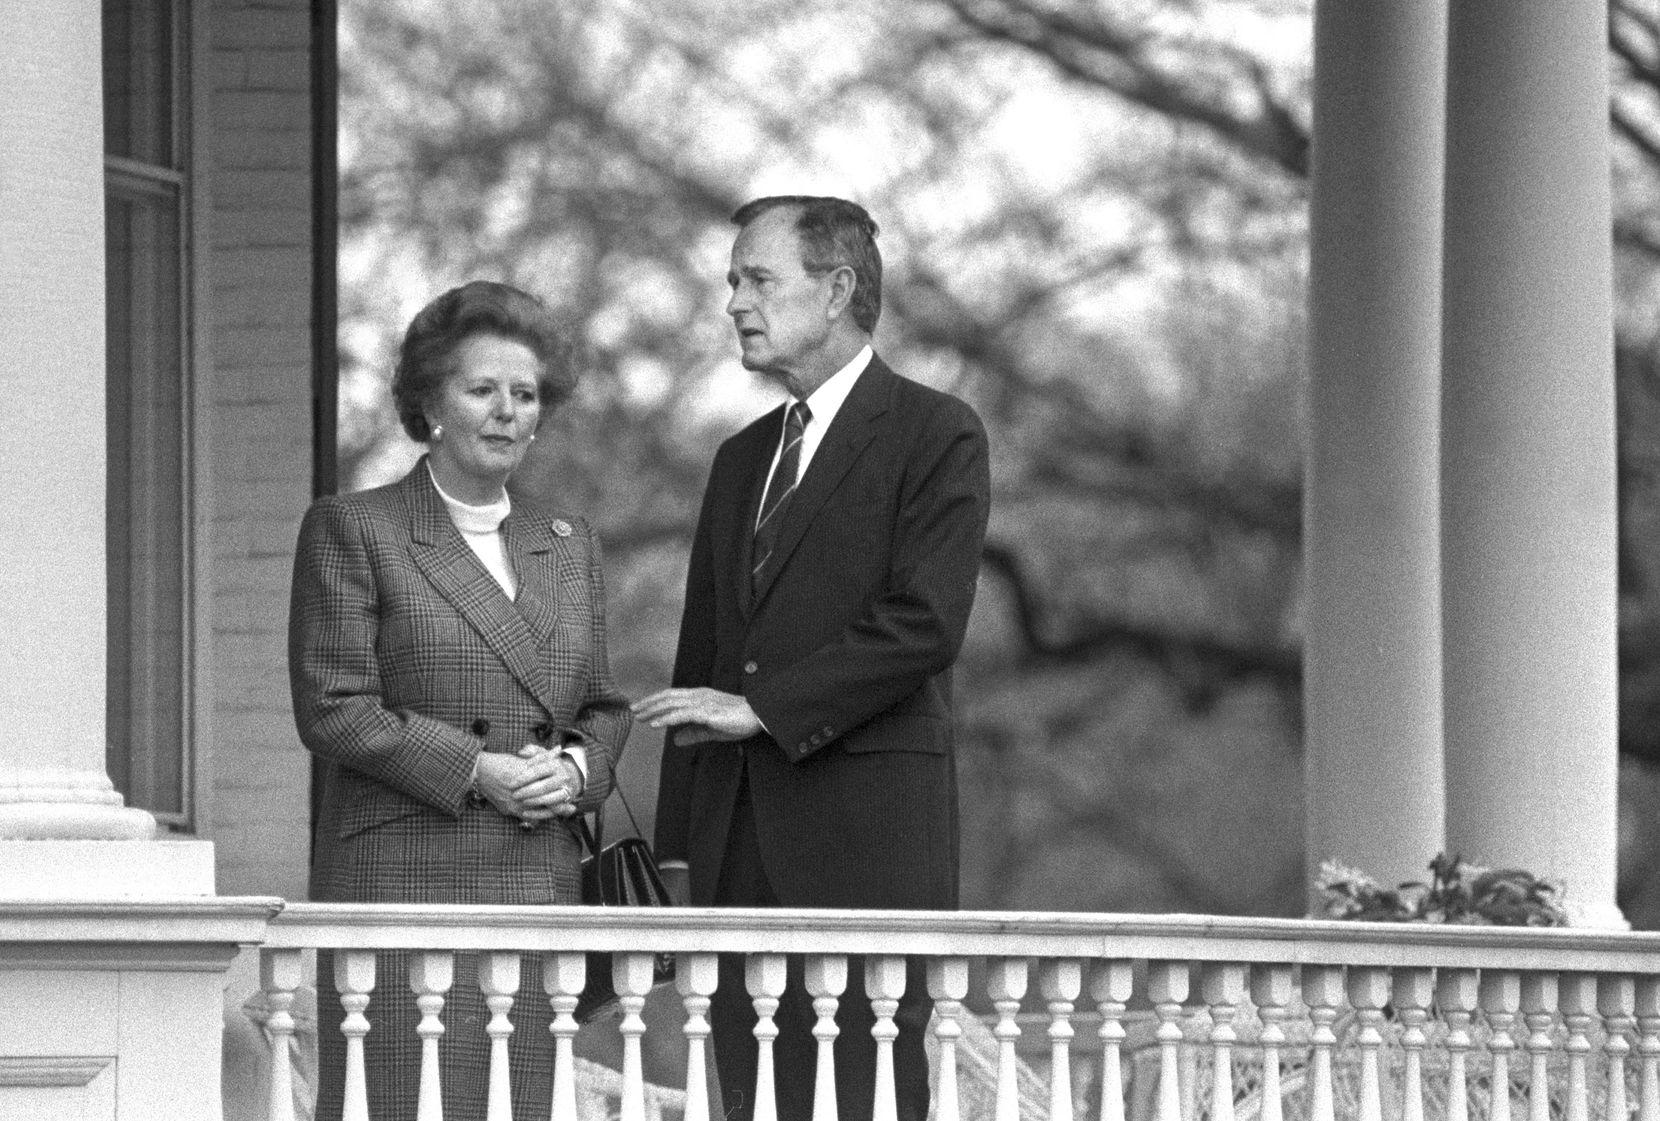 1988: President-elect George H.W. Bush speaks with British Prime Minister Margaret Thatcher in Washington.